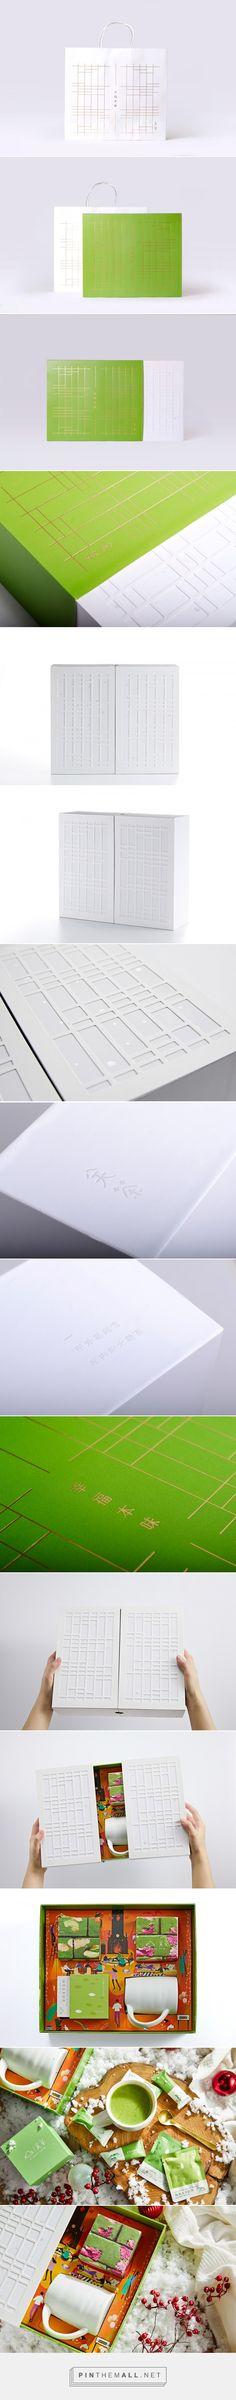 Guan Tea - Happiness Gift Box packaging design by Mint Brand - https://www.packagingoftheworld.com/2018/04/guan-tea-happiness-gift-box.html